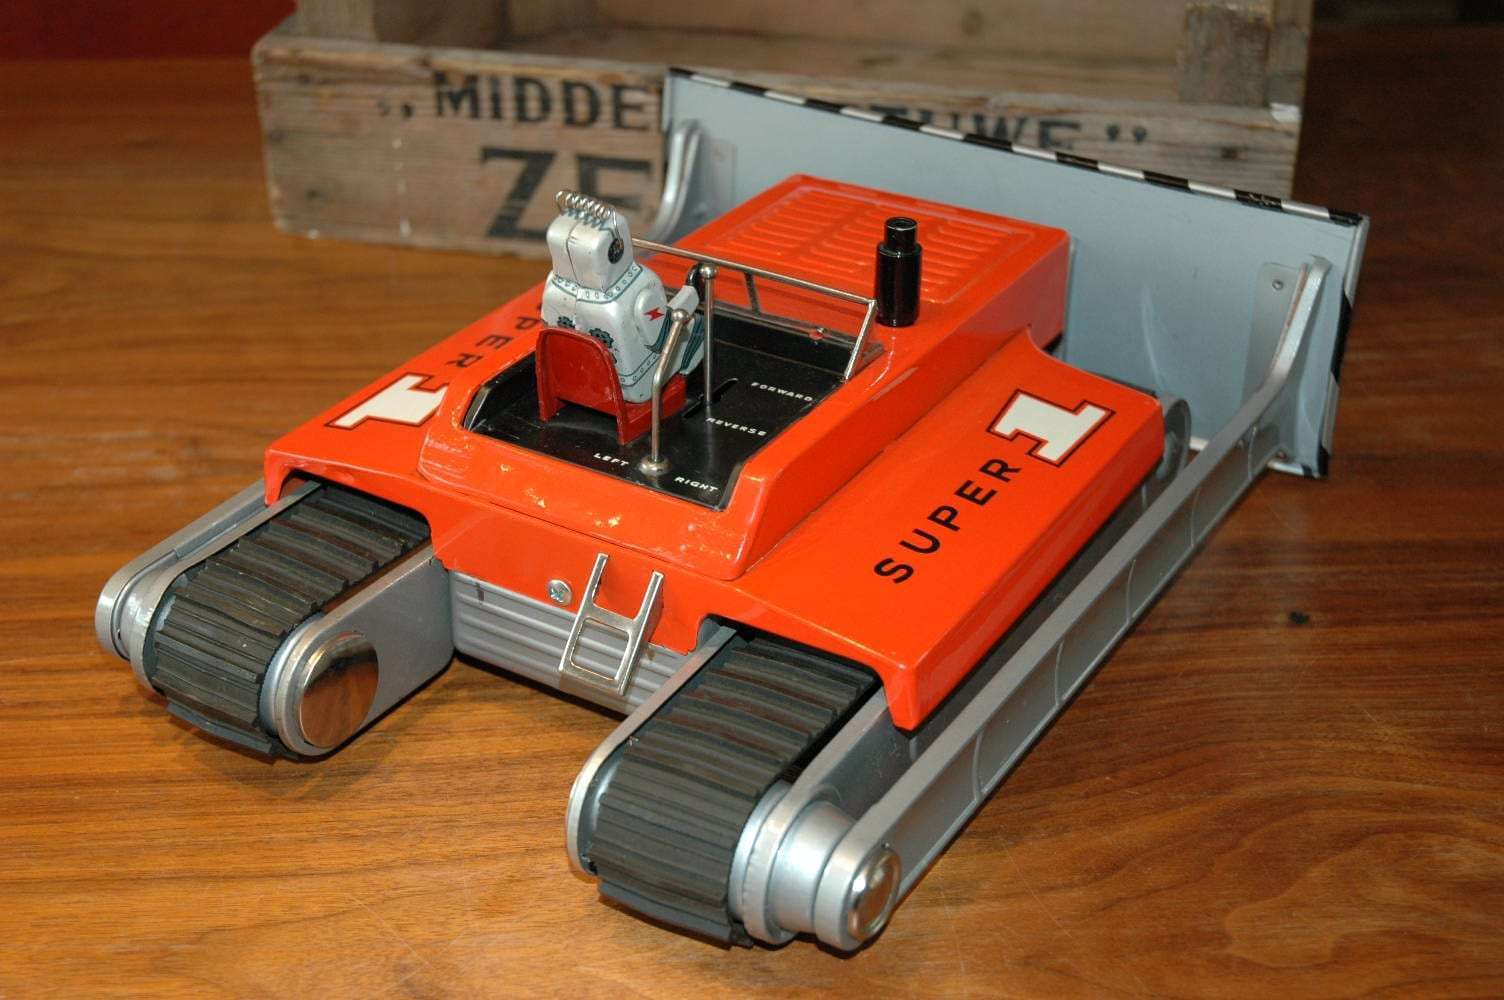 VST - Super 1 Robot Bulldozer